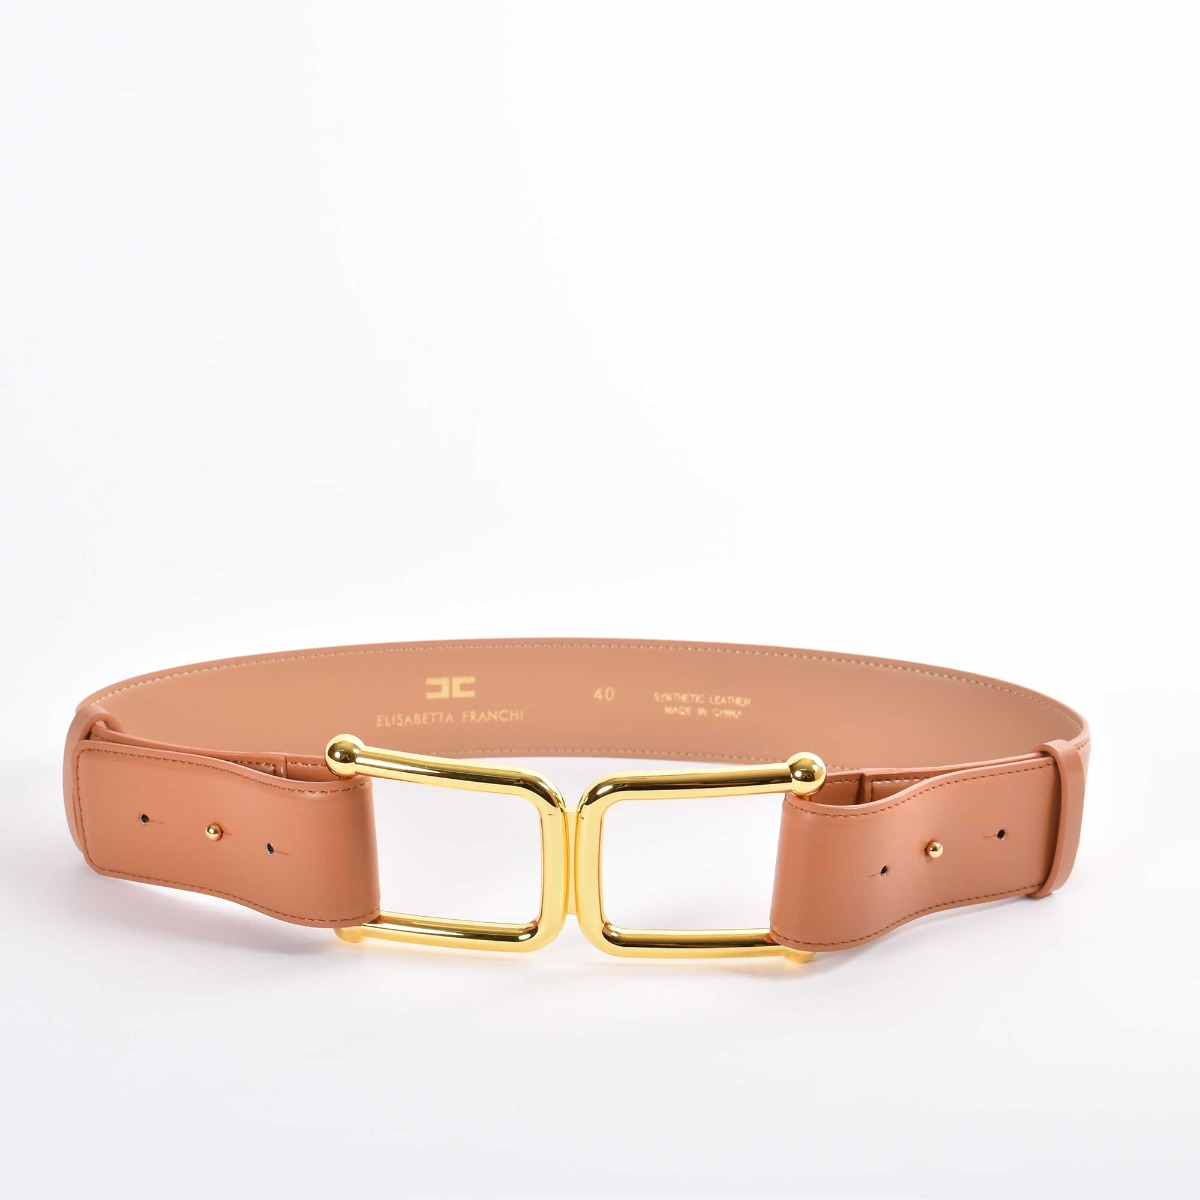 Cintura logo cc - Cuoio